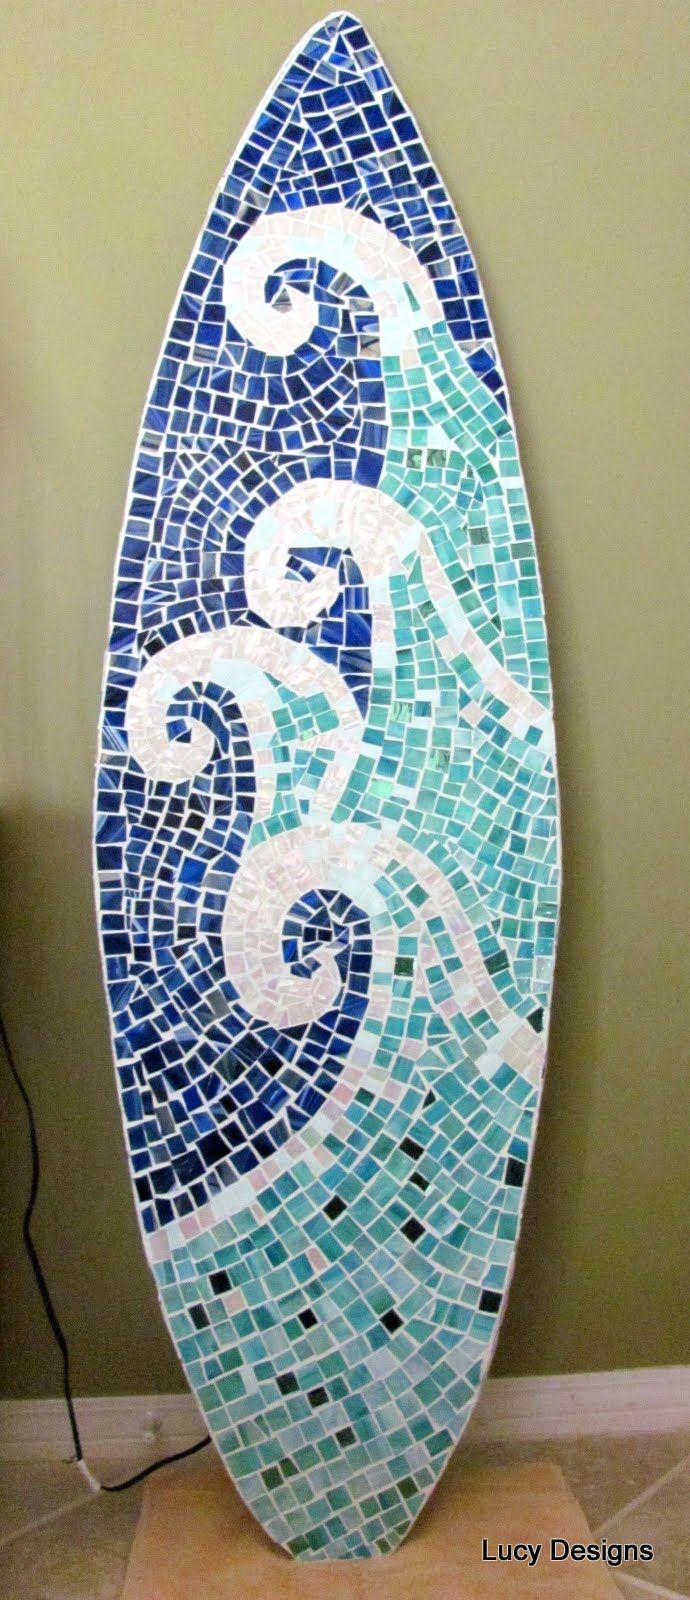 17 Best Images About Mosaics On Pinterest Mosaic Tables